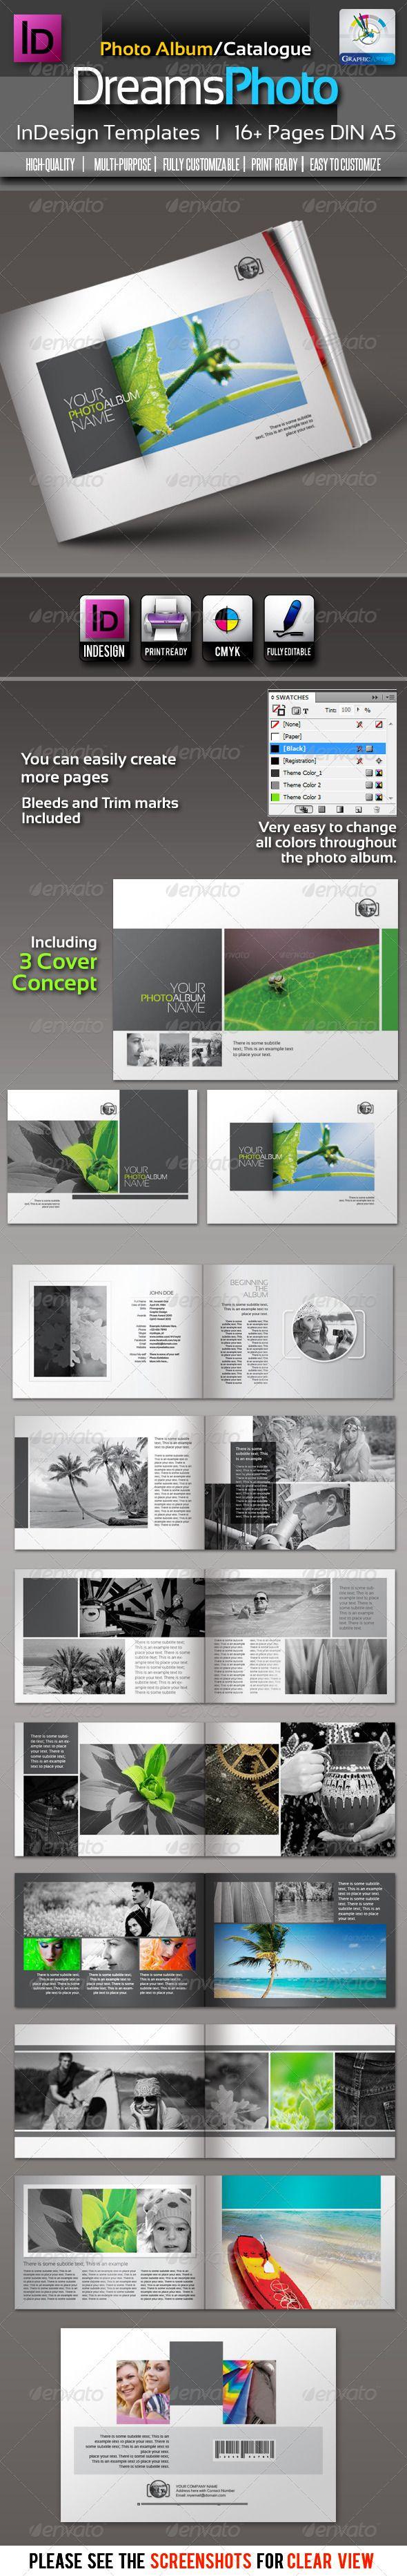 GraphicRiver Dreams Clean Photo Album InDesign Templates 2622174 ...